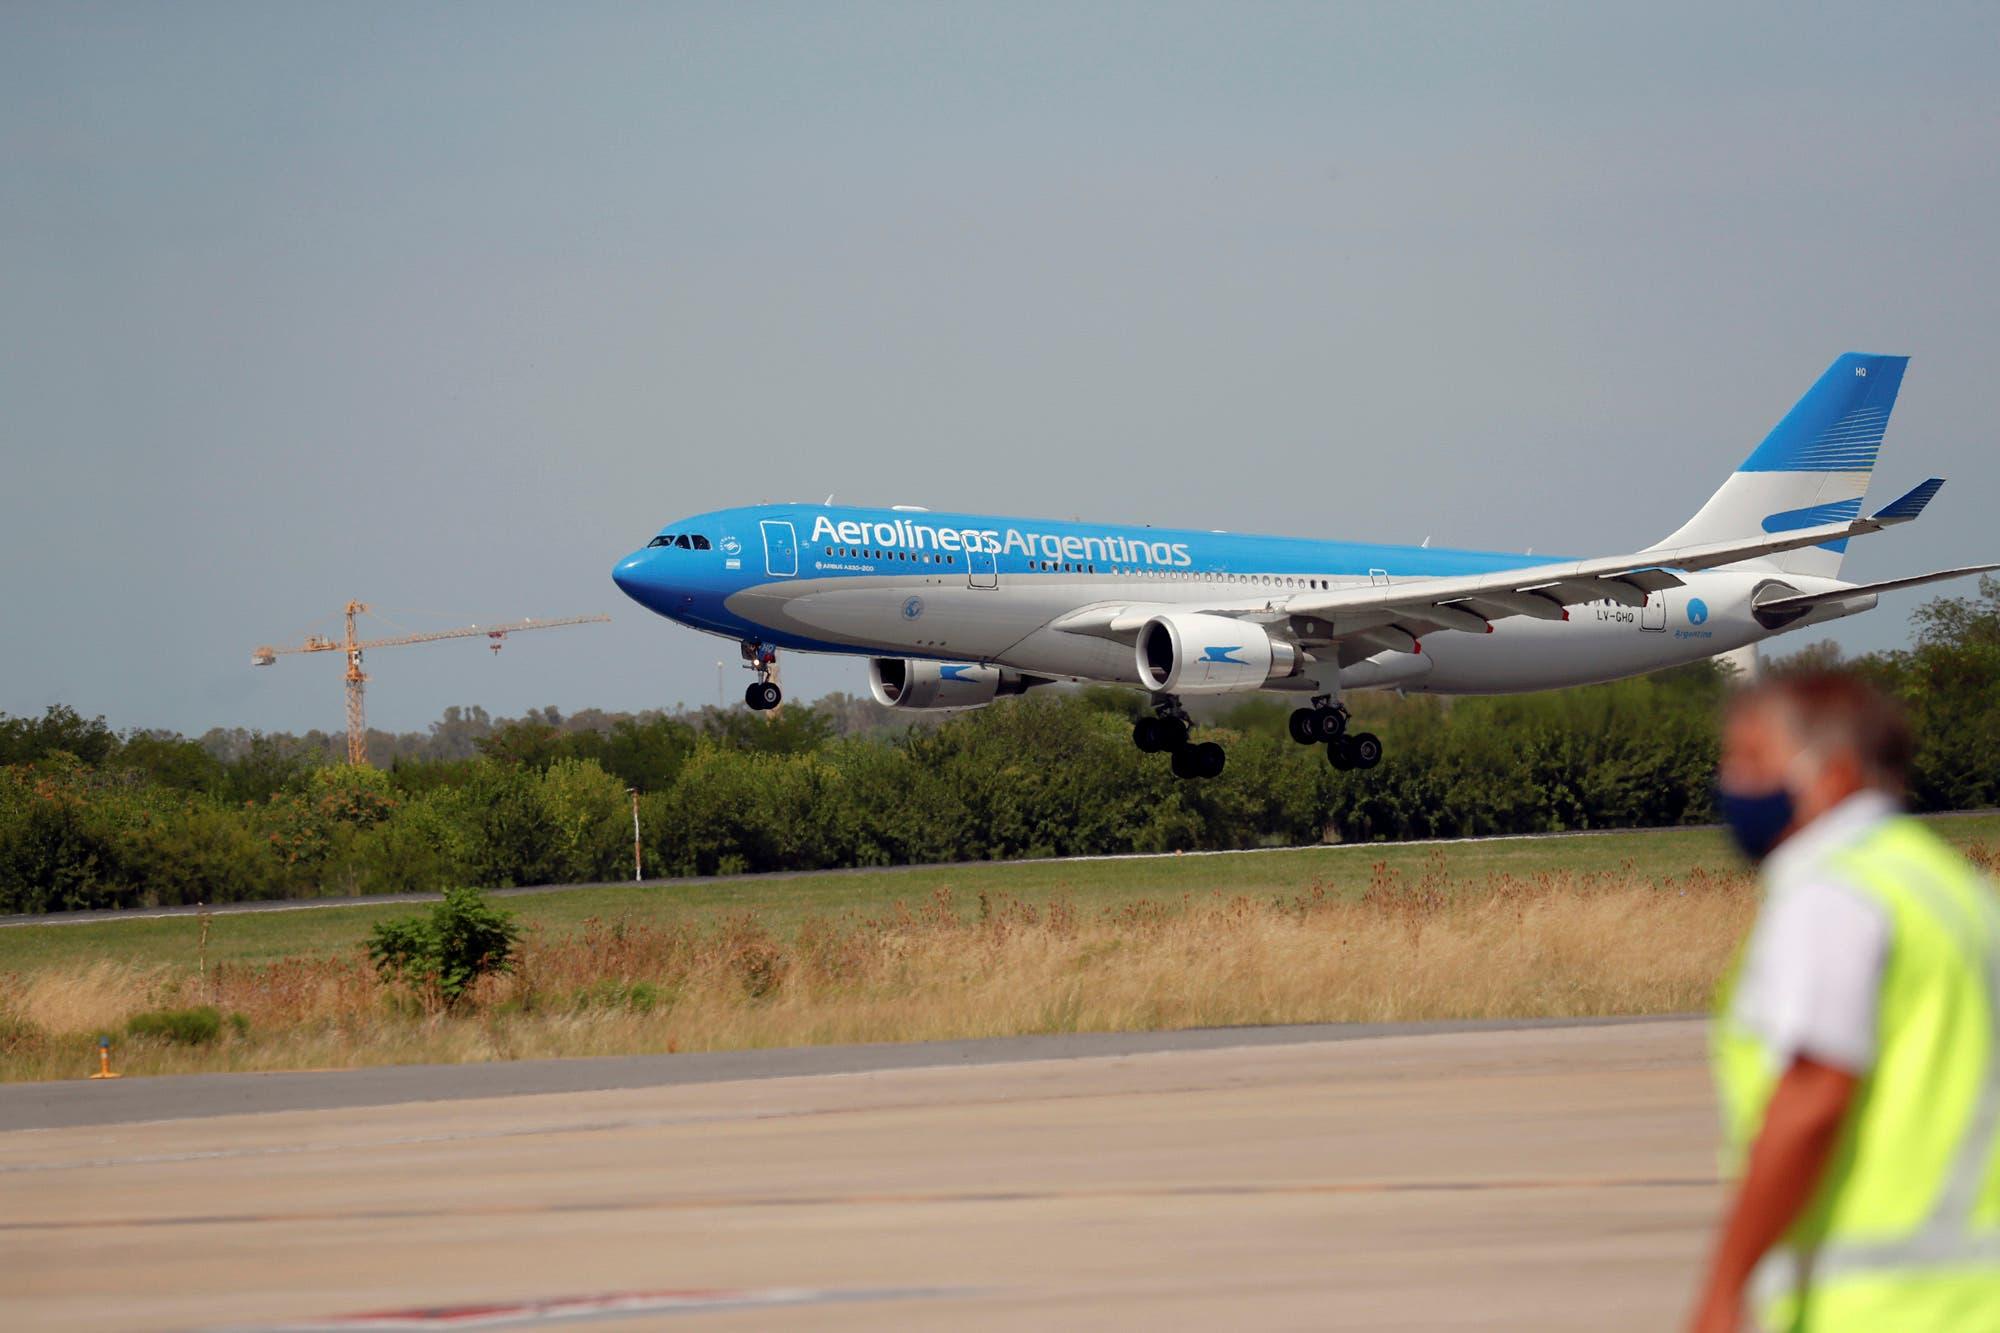 Coronavirus: aterrizó en Ezeiza un vuelo de Aerolíneas Argentinas con 517.500 dosis de Sputnik V